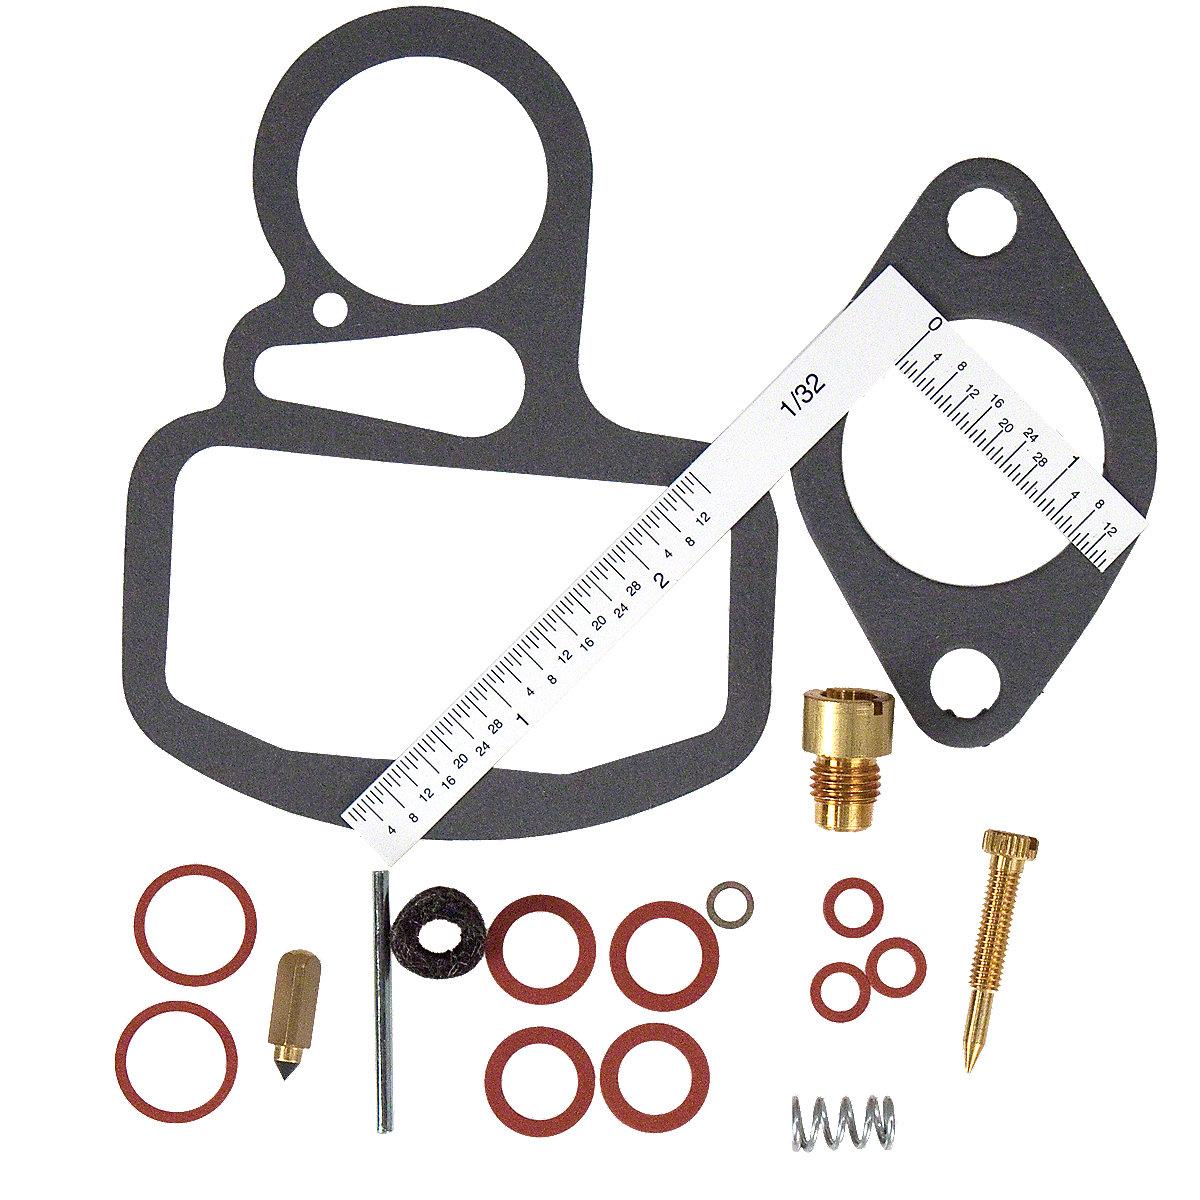 Abc222 Economy Carburetor Repair Kit Zenith Diagram